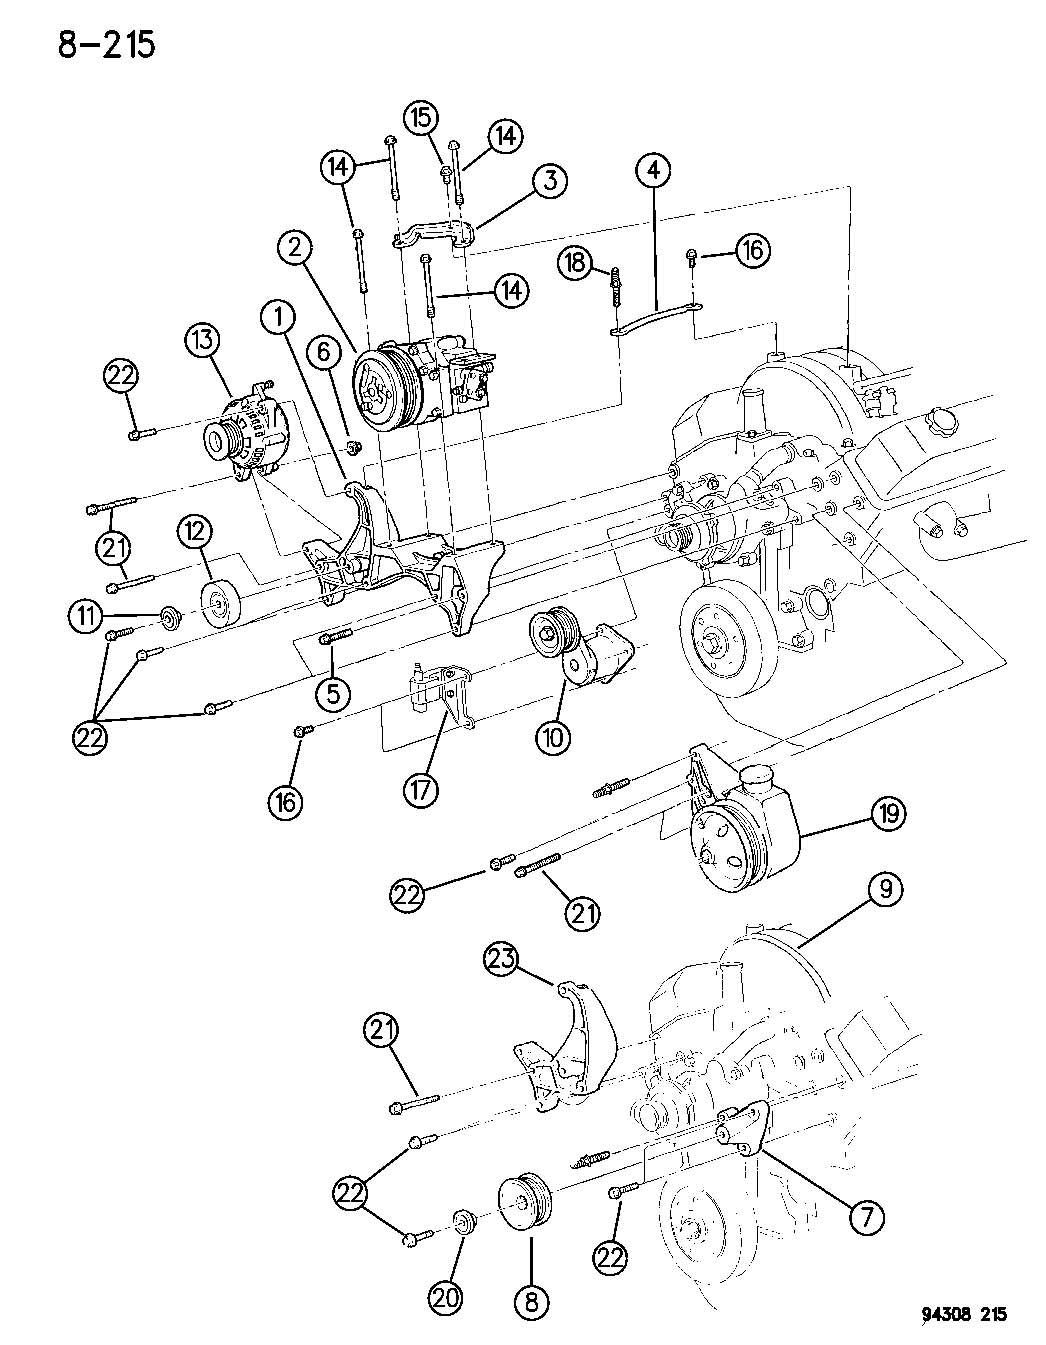 1994 Dodge Dakota ALTERNATOR MOUNTING 6-8 CYLINDER ENGINE